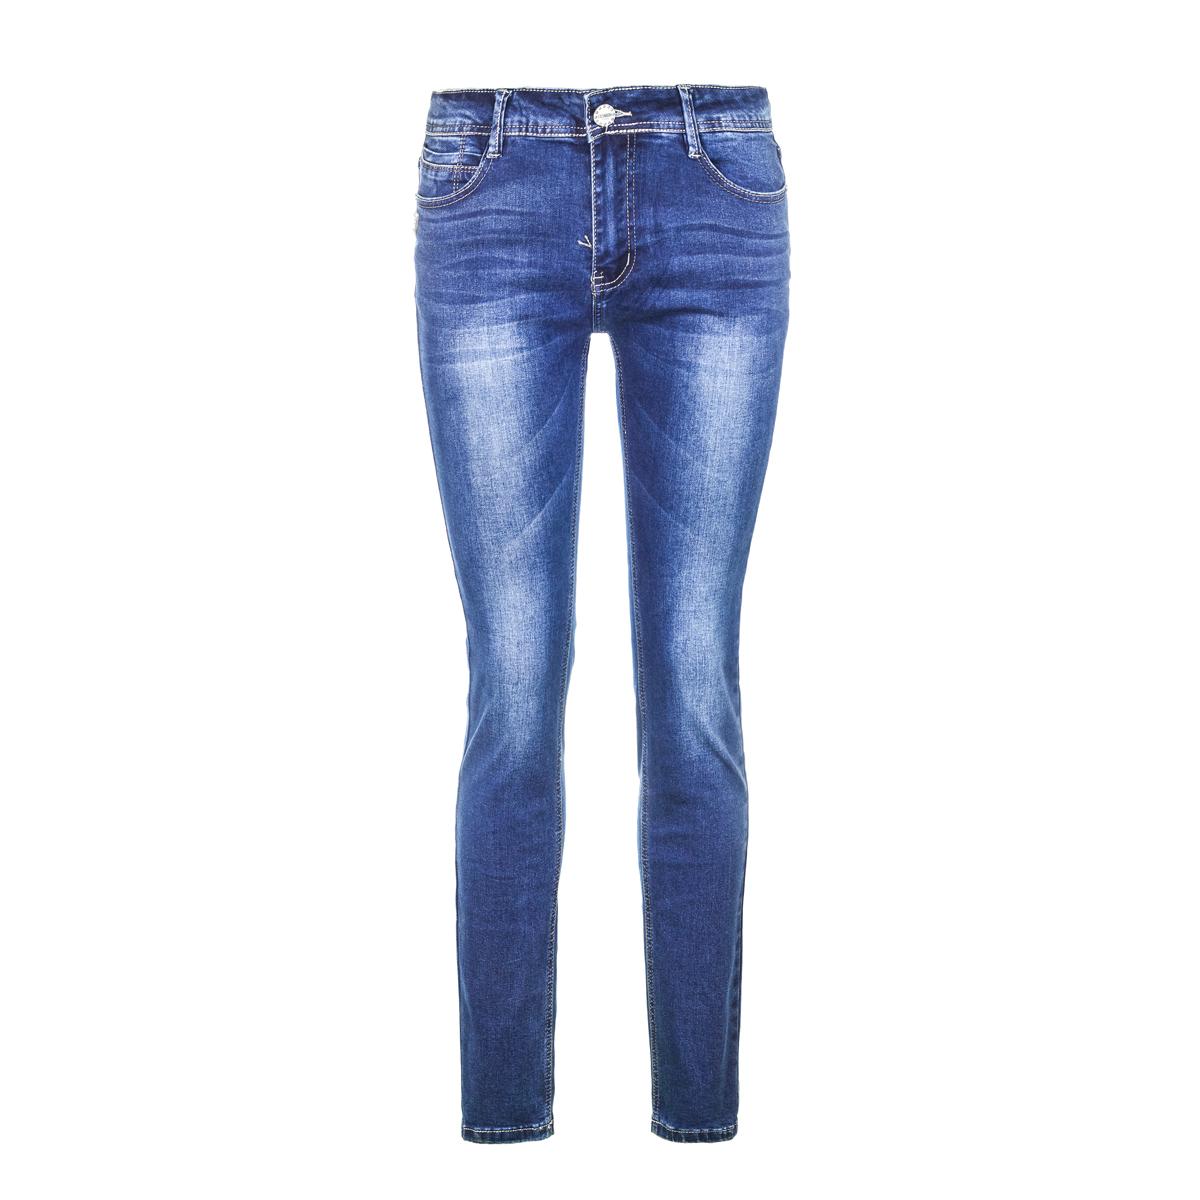 Жен. джинсы арт. 12-0089 Синий р. 30